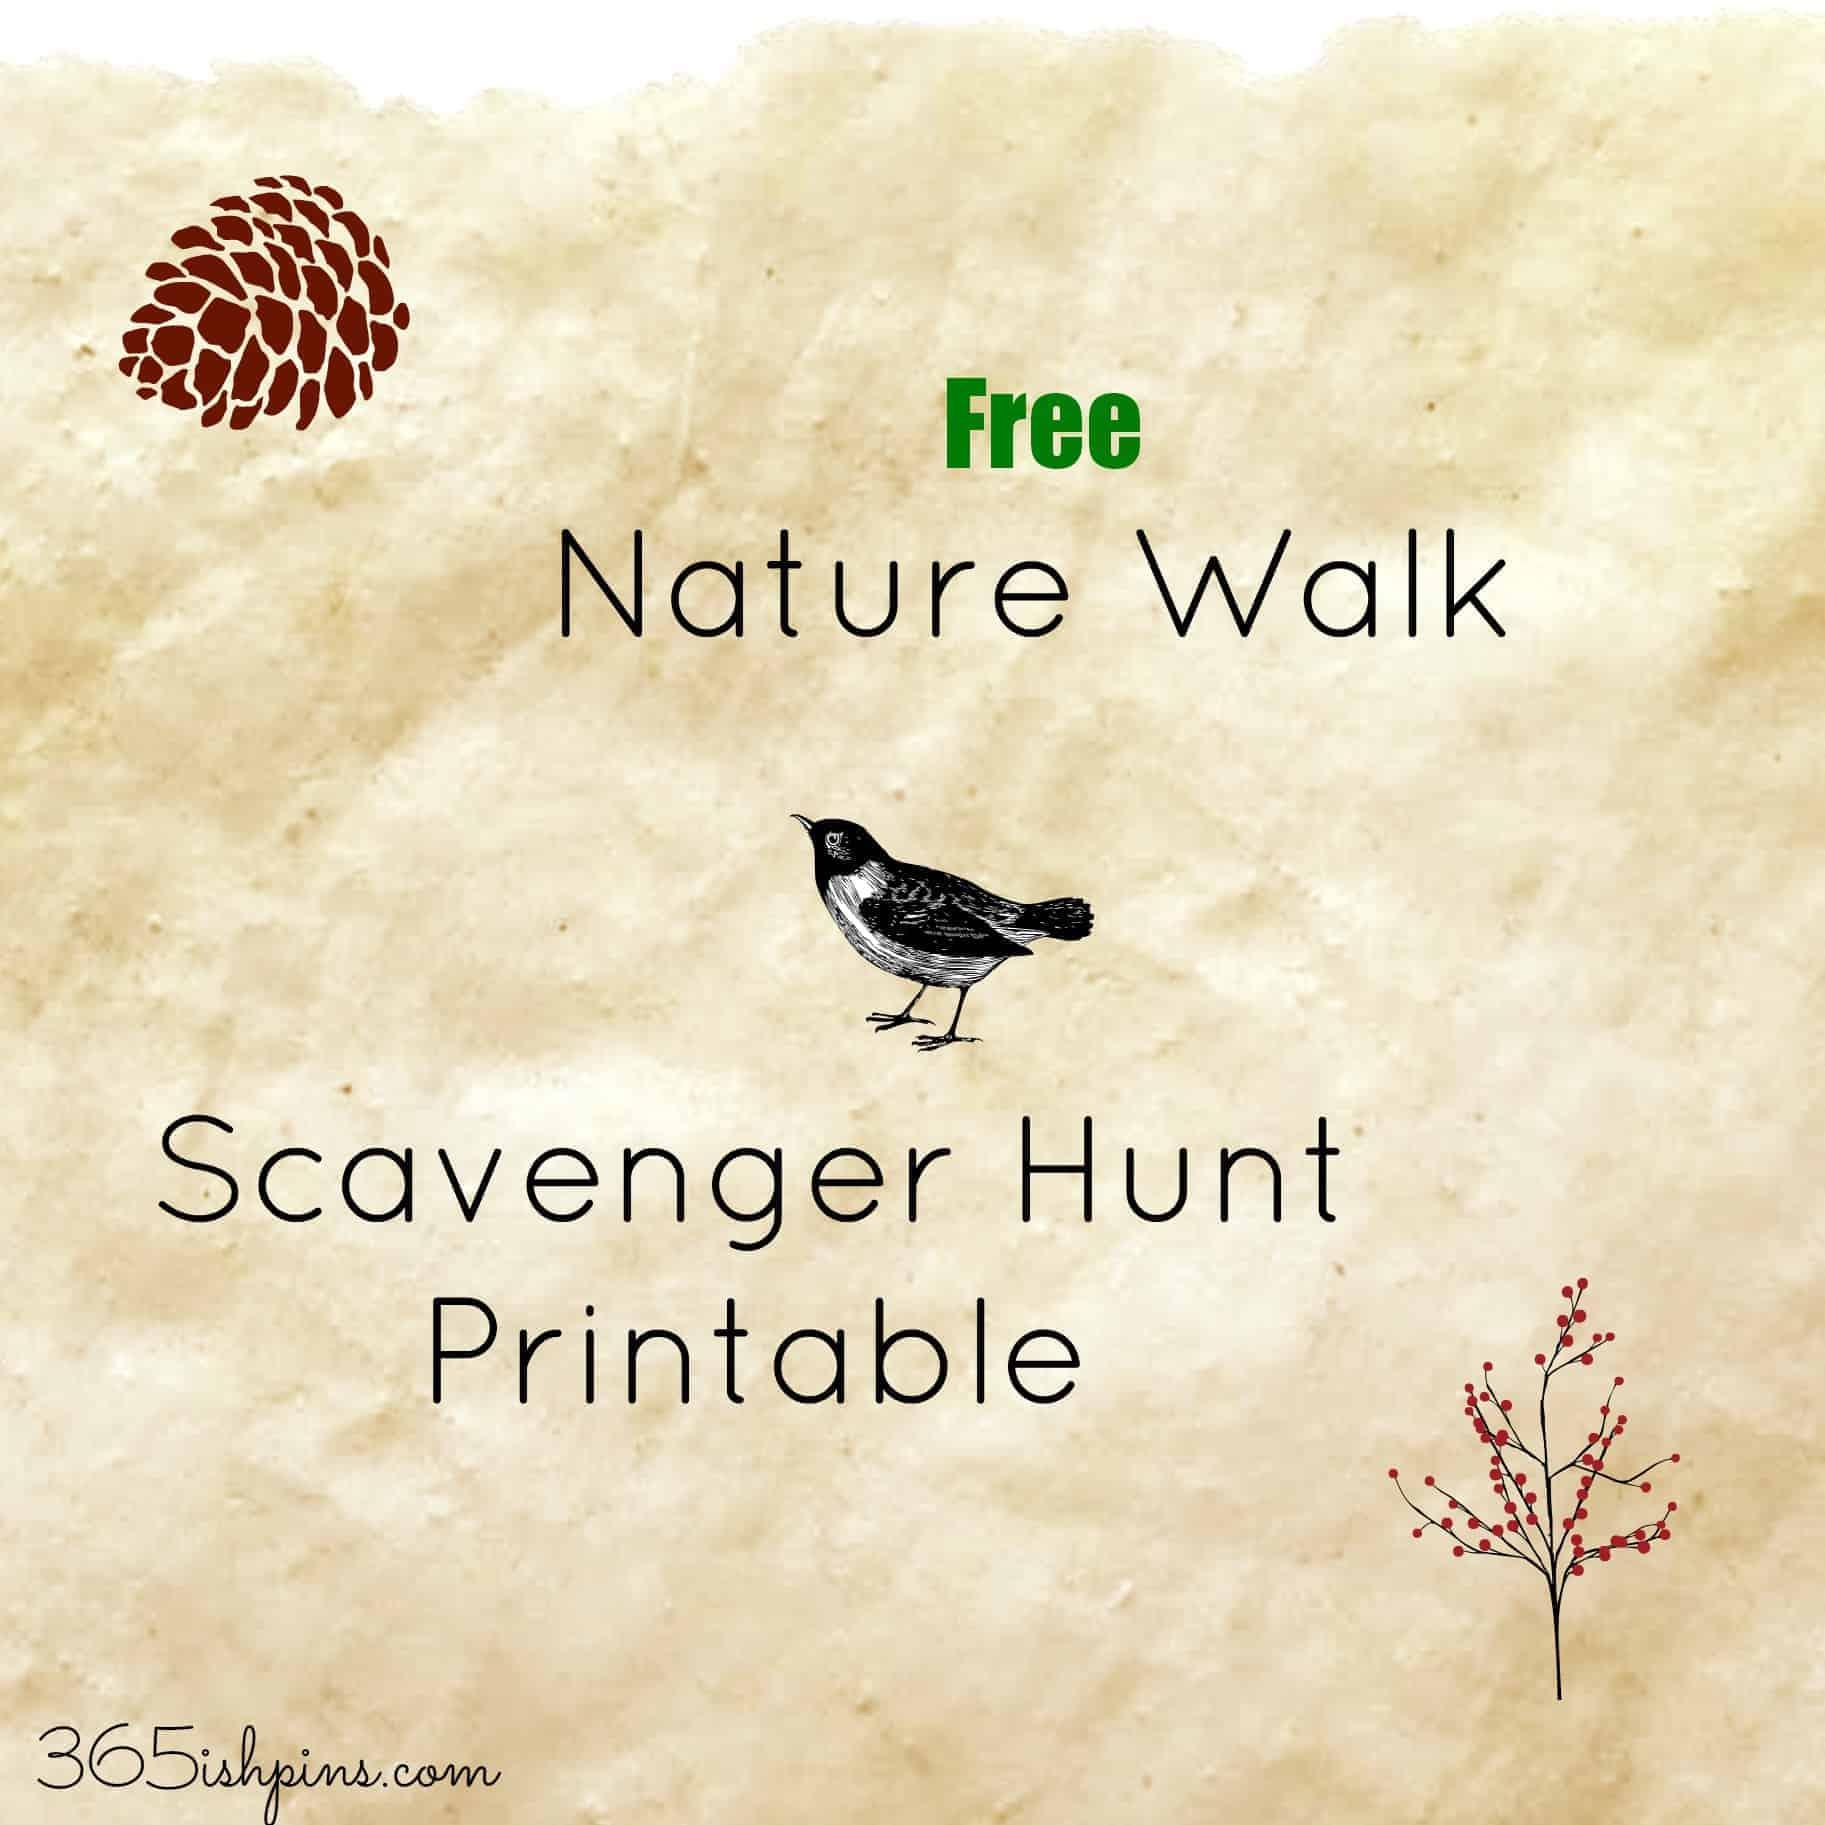 Day 328 Nature Walk Scavenger Hunt Printable